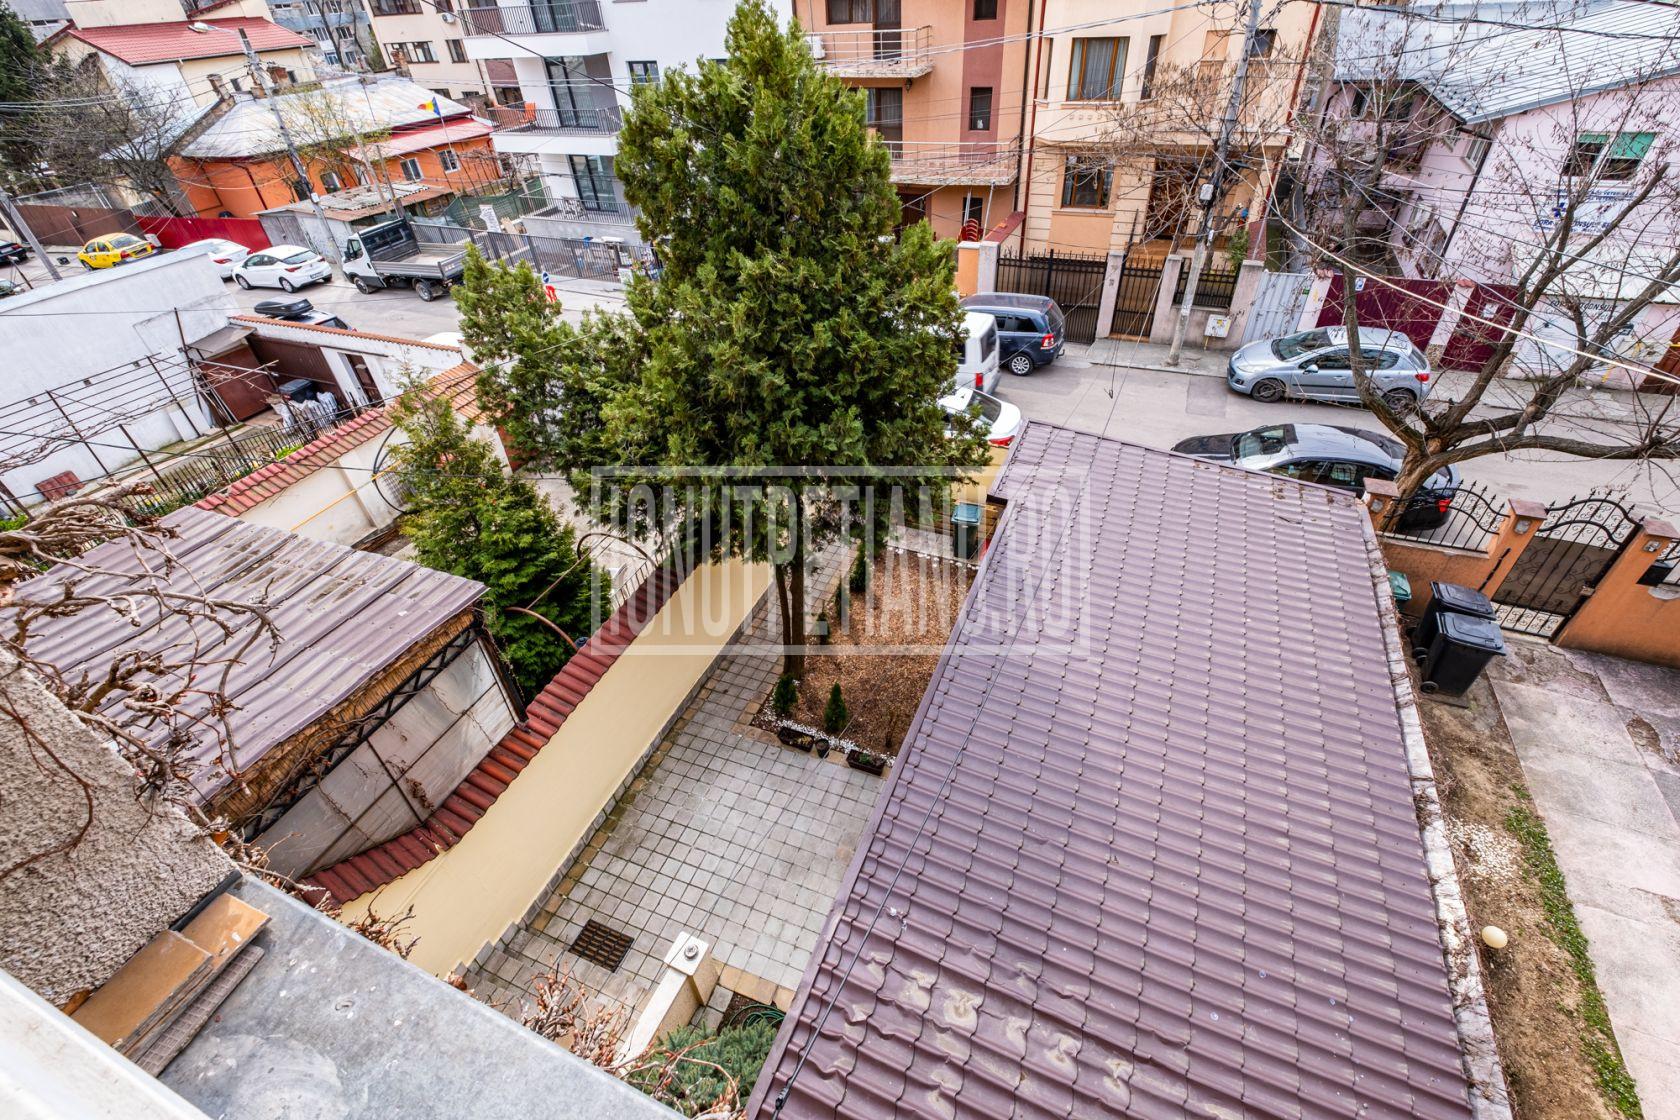 Basarabia - Nicolae Grigorescu vila de inchiriat perfect sediu firma